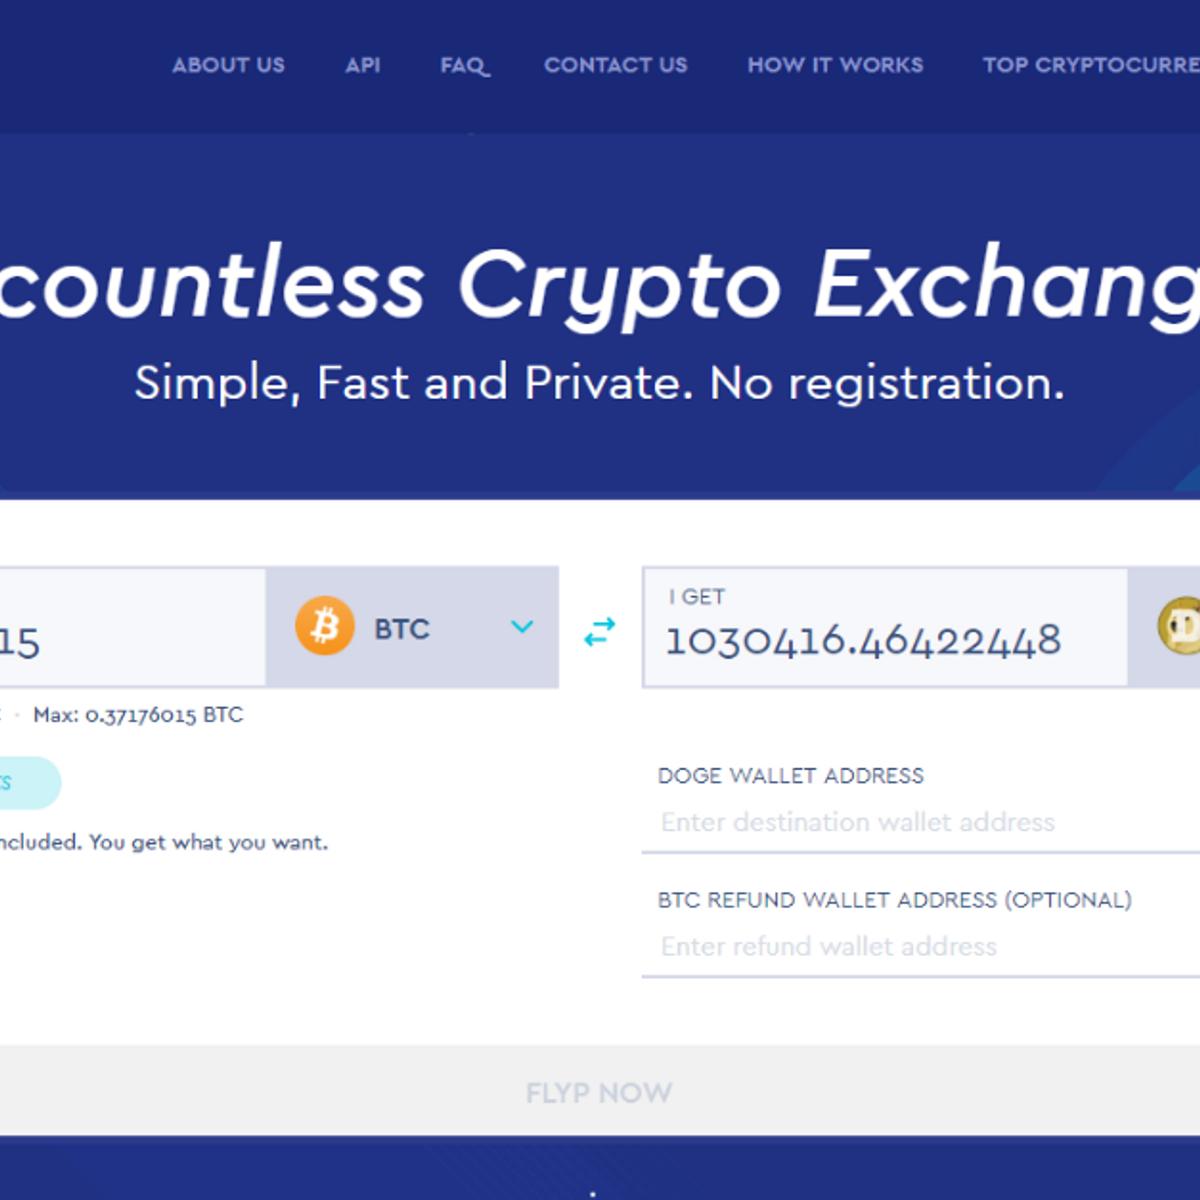 open source cryptocurrency exchange like shapeshift